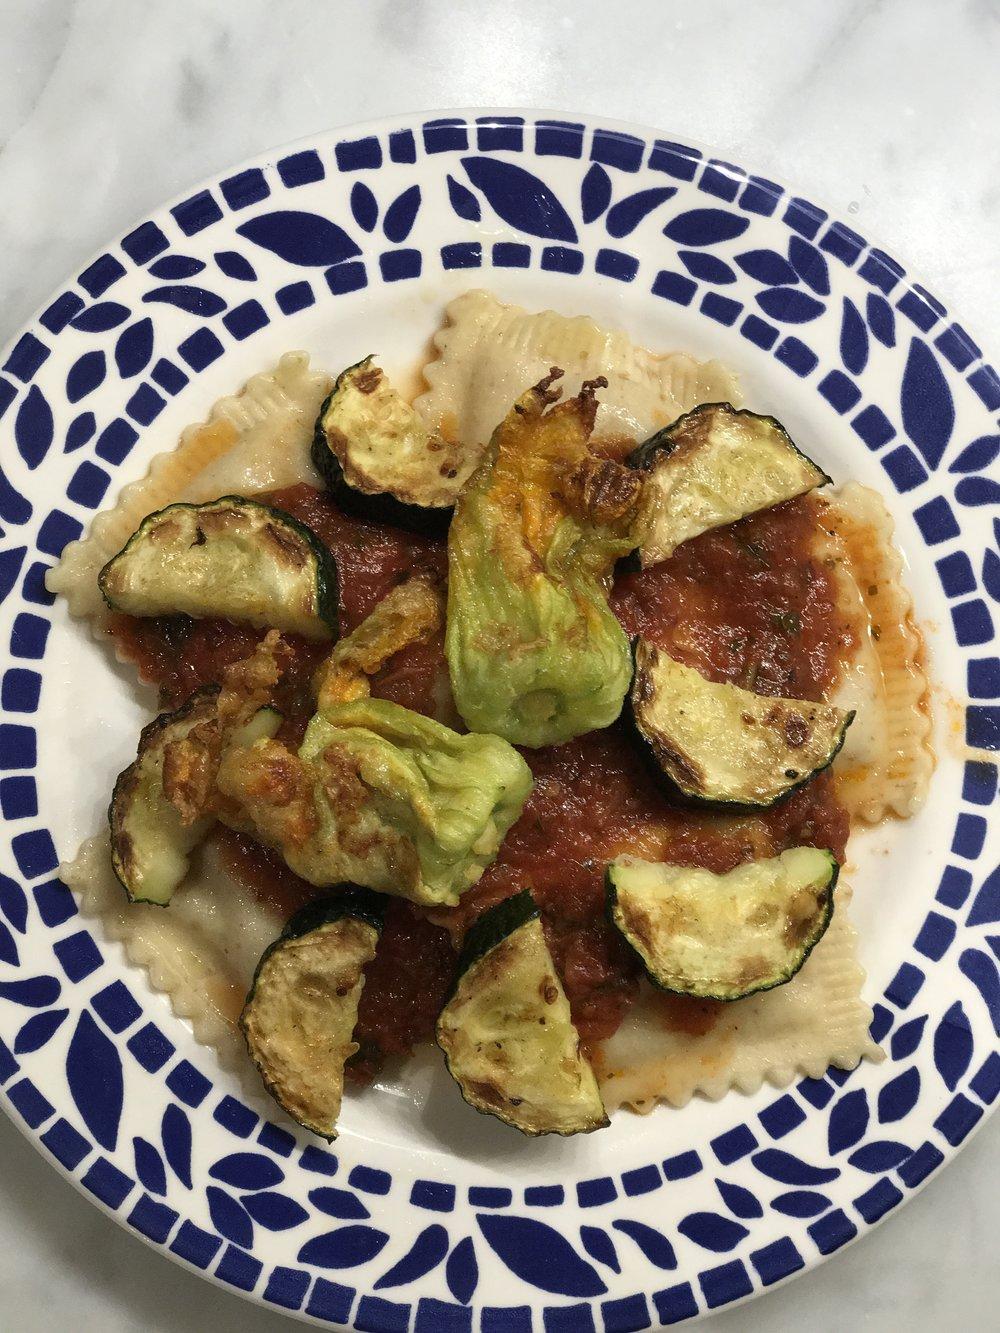 Fried zucchini flowers, zucchini, & our Red Gravy  (feat. Zucchini alla Parmigiana Ravioli)